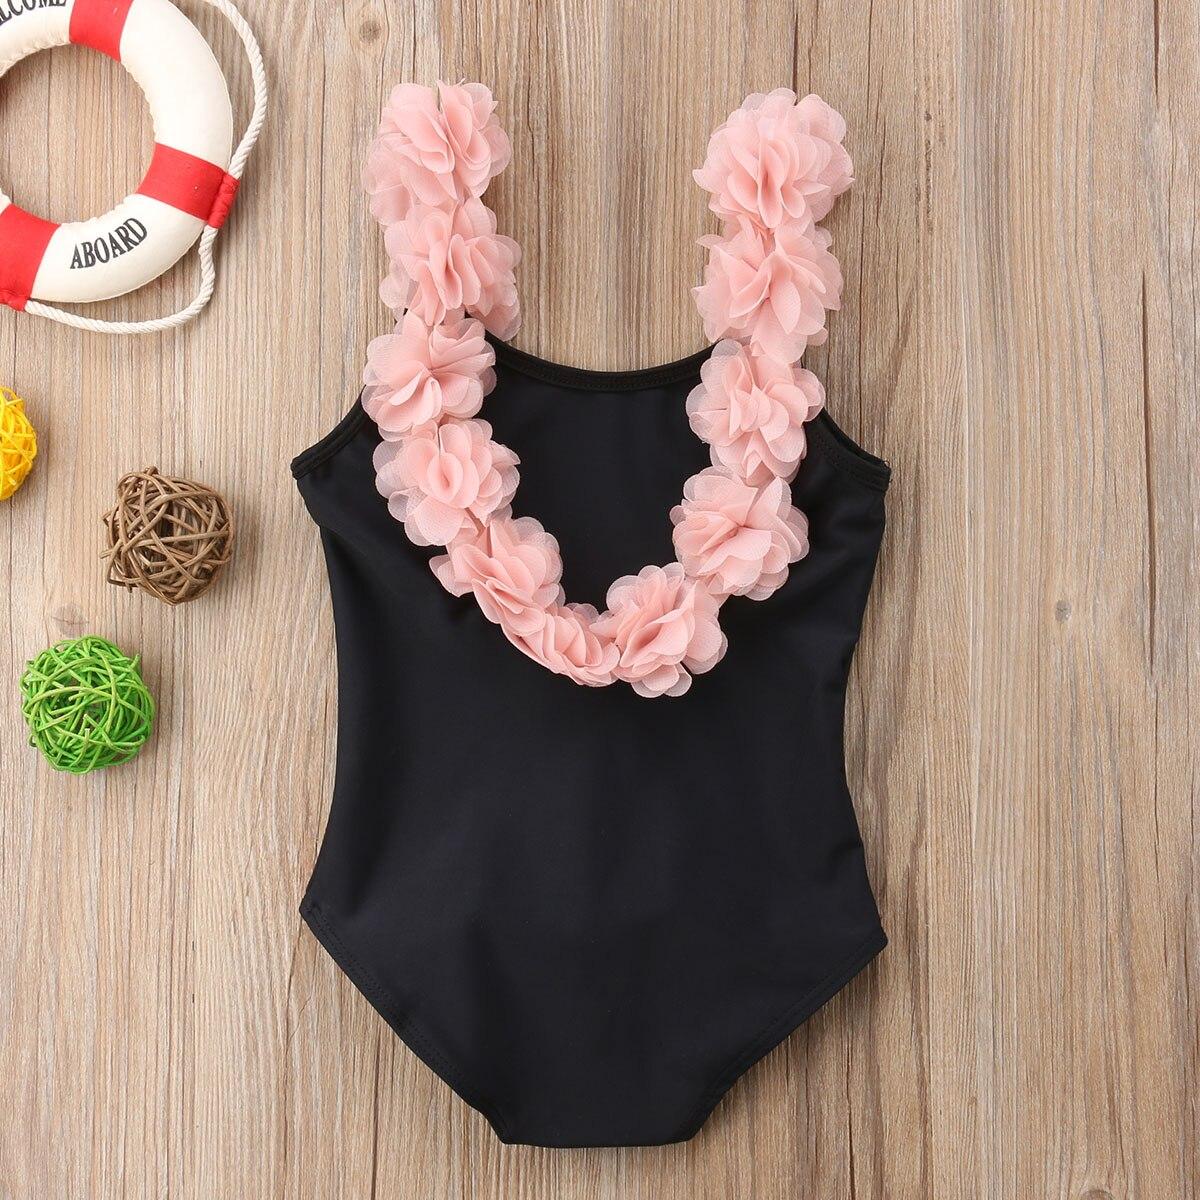 Swimwear Pudcoco 2019 Brand Summer Kids Baby Girl Bikini Suit Bowknot Flamingo Swimwear Beachwear Swimming 1-6y Reliable Performance